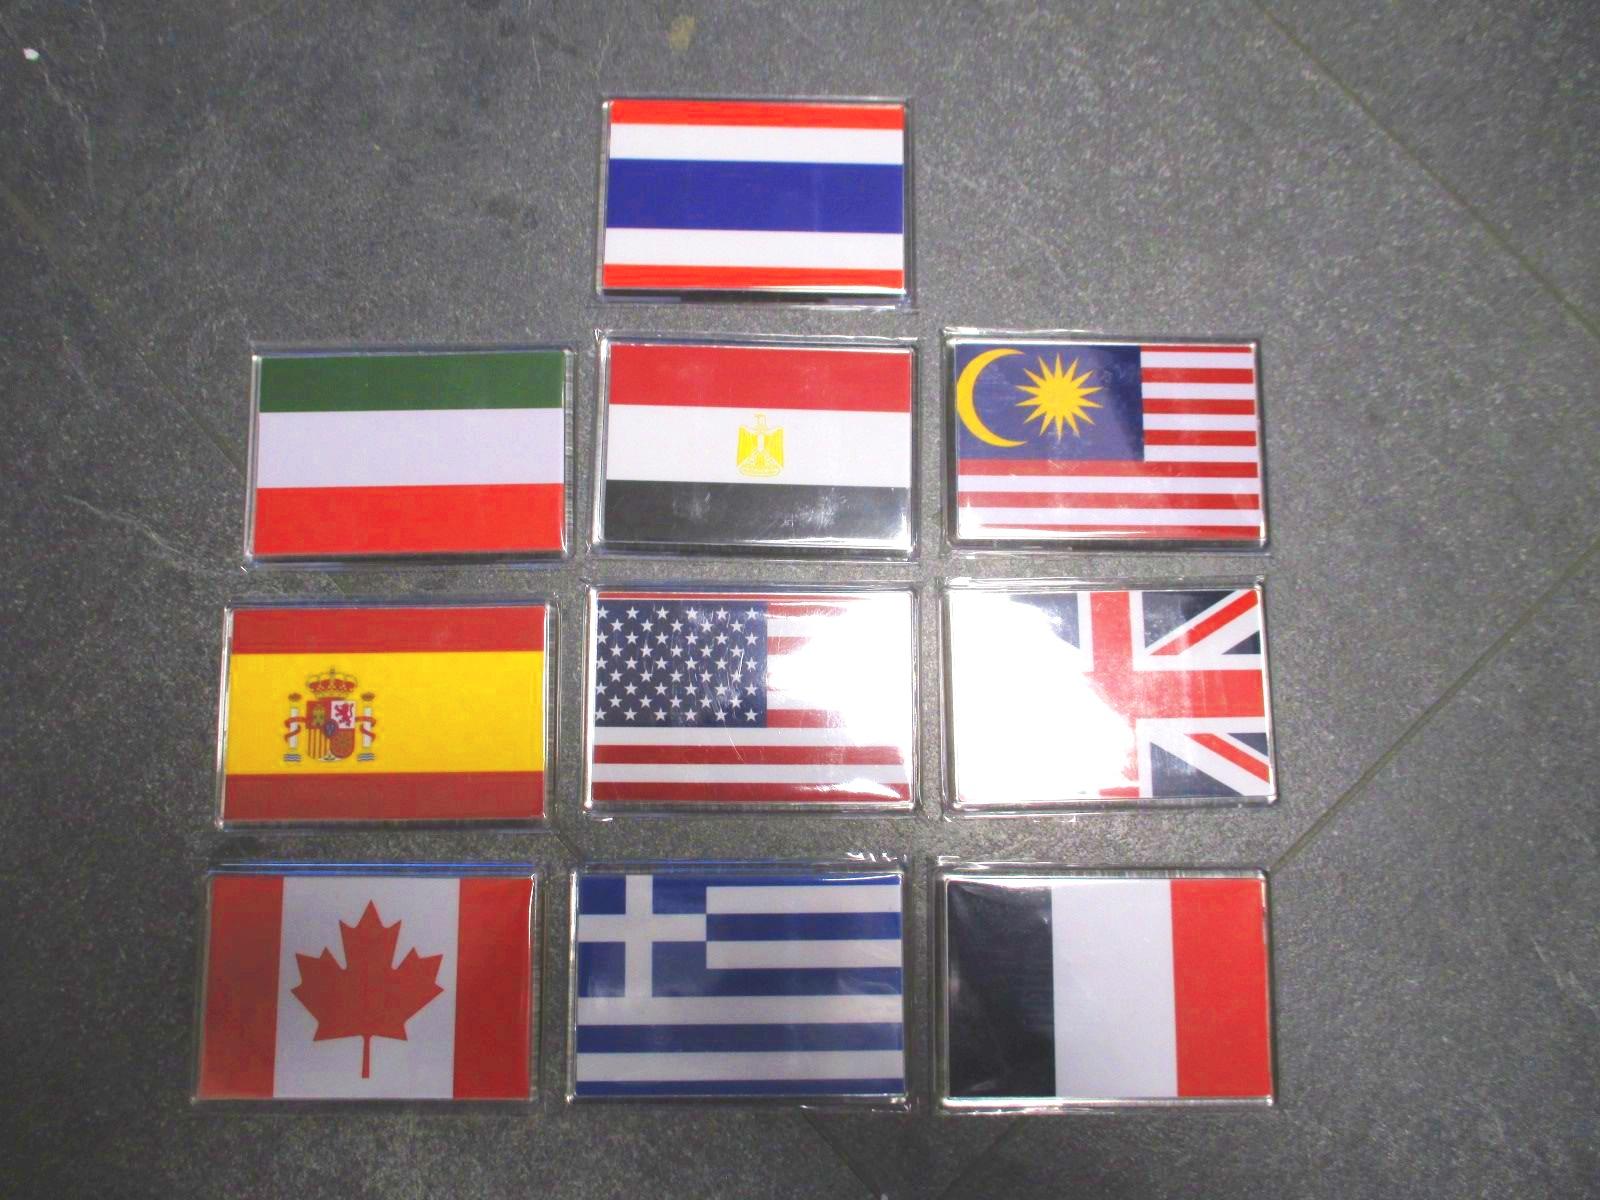 Magnet Arabische Emirate UAE Fahne Flagge,Souvenir Fridge,Dubai